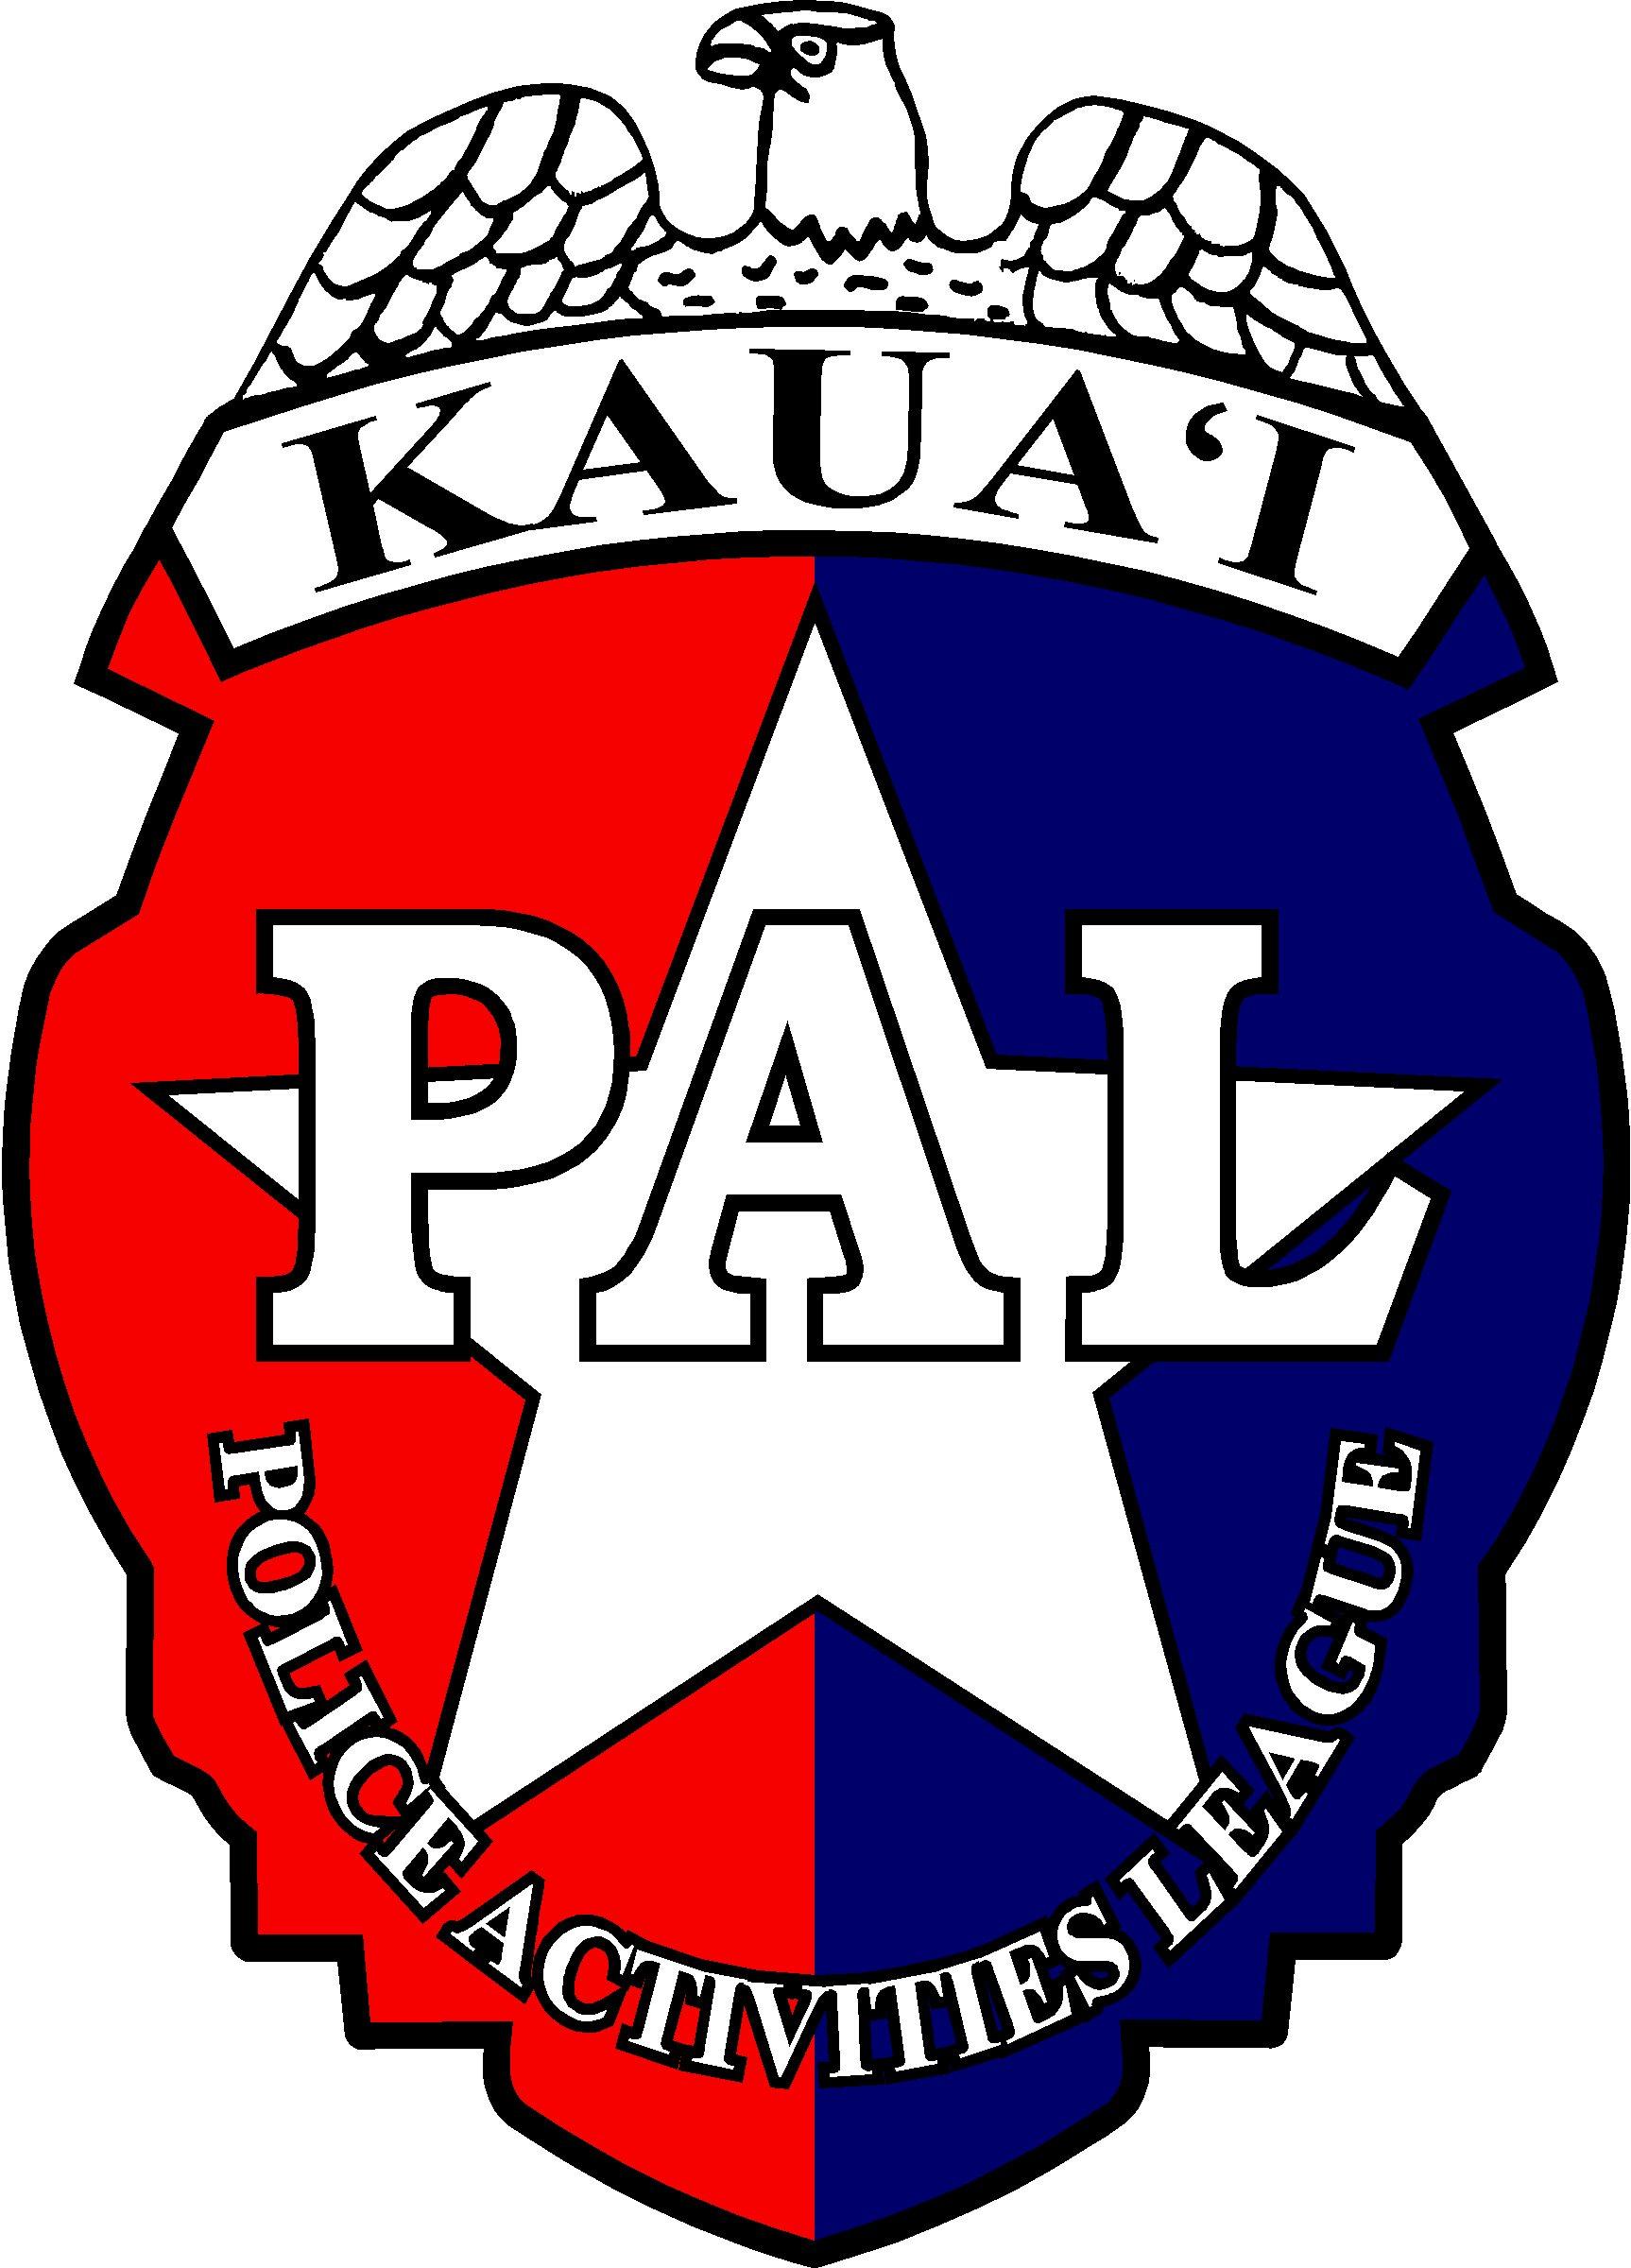 KPAL_logo